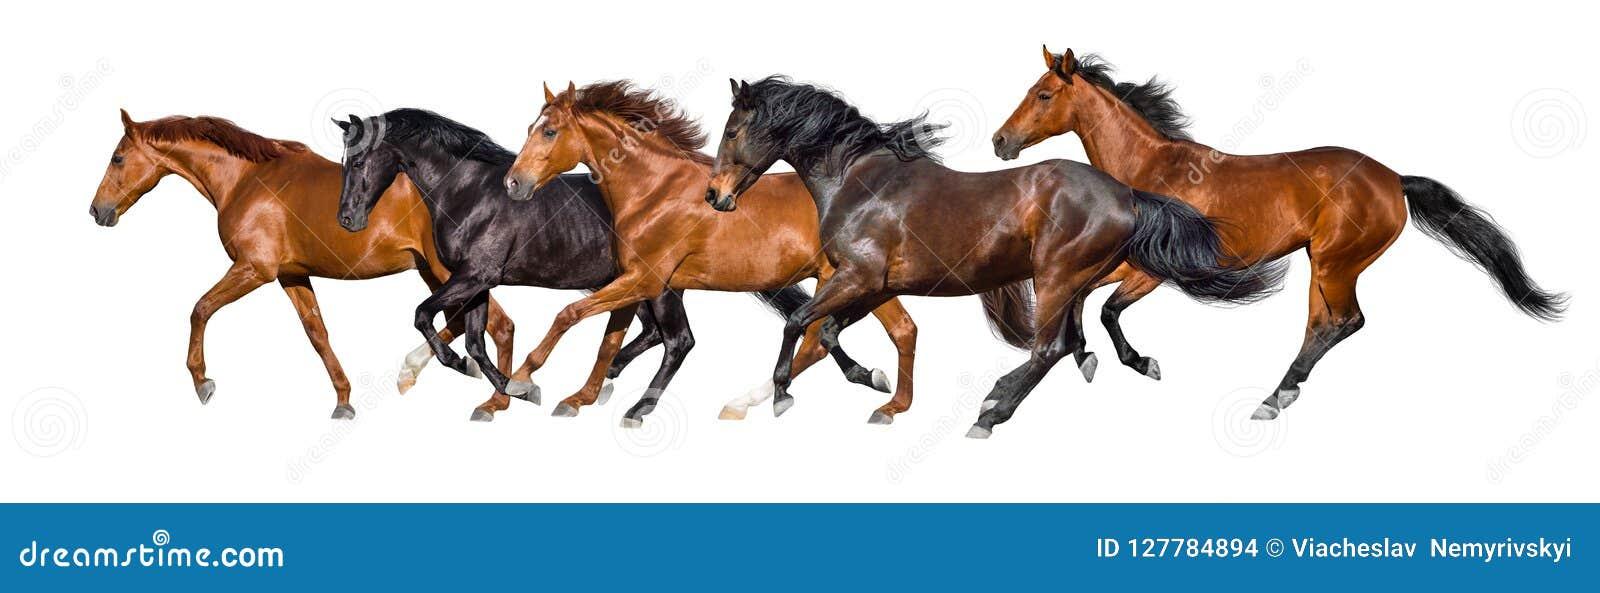 Horses run isolated